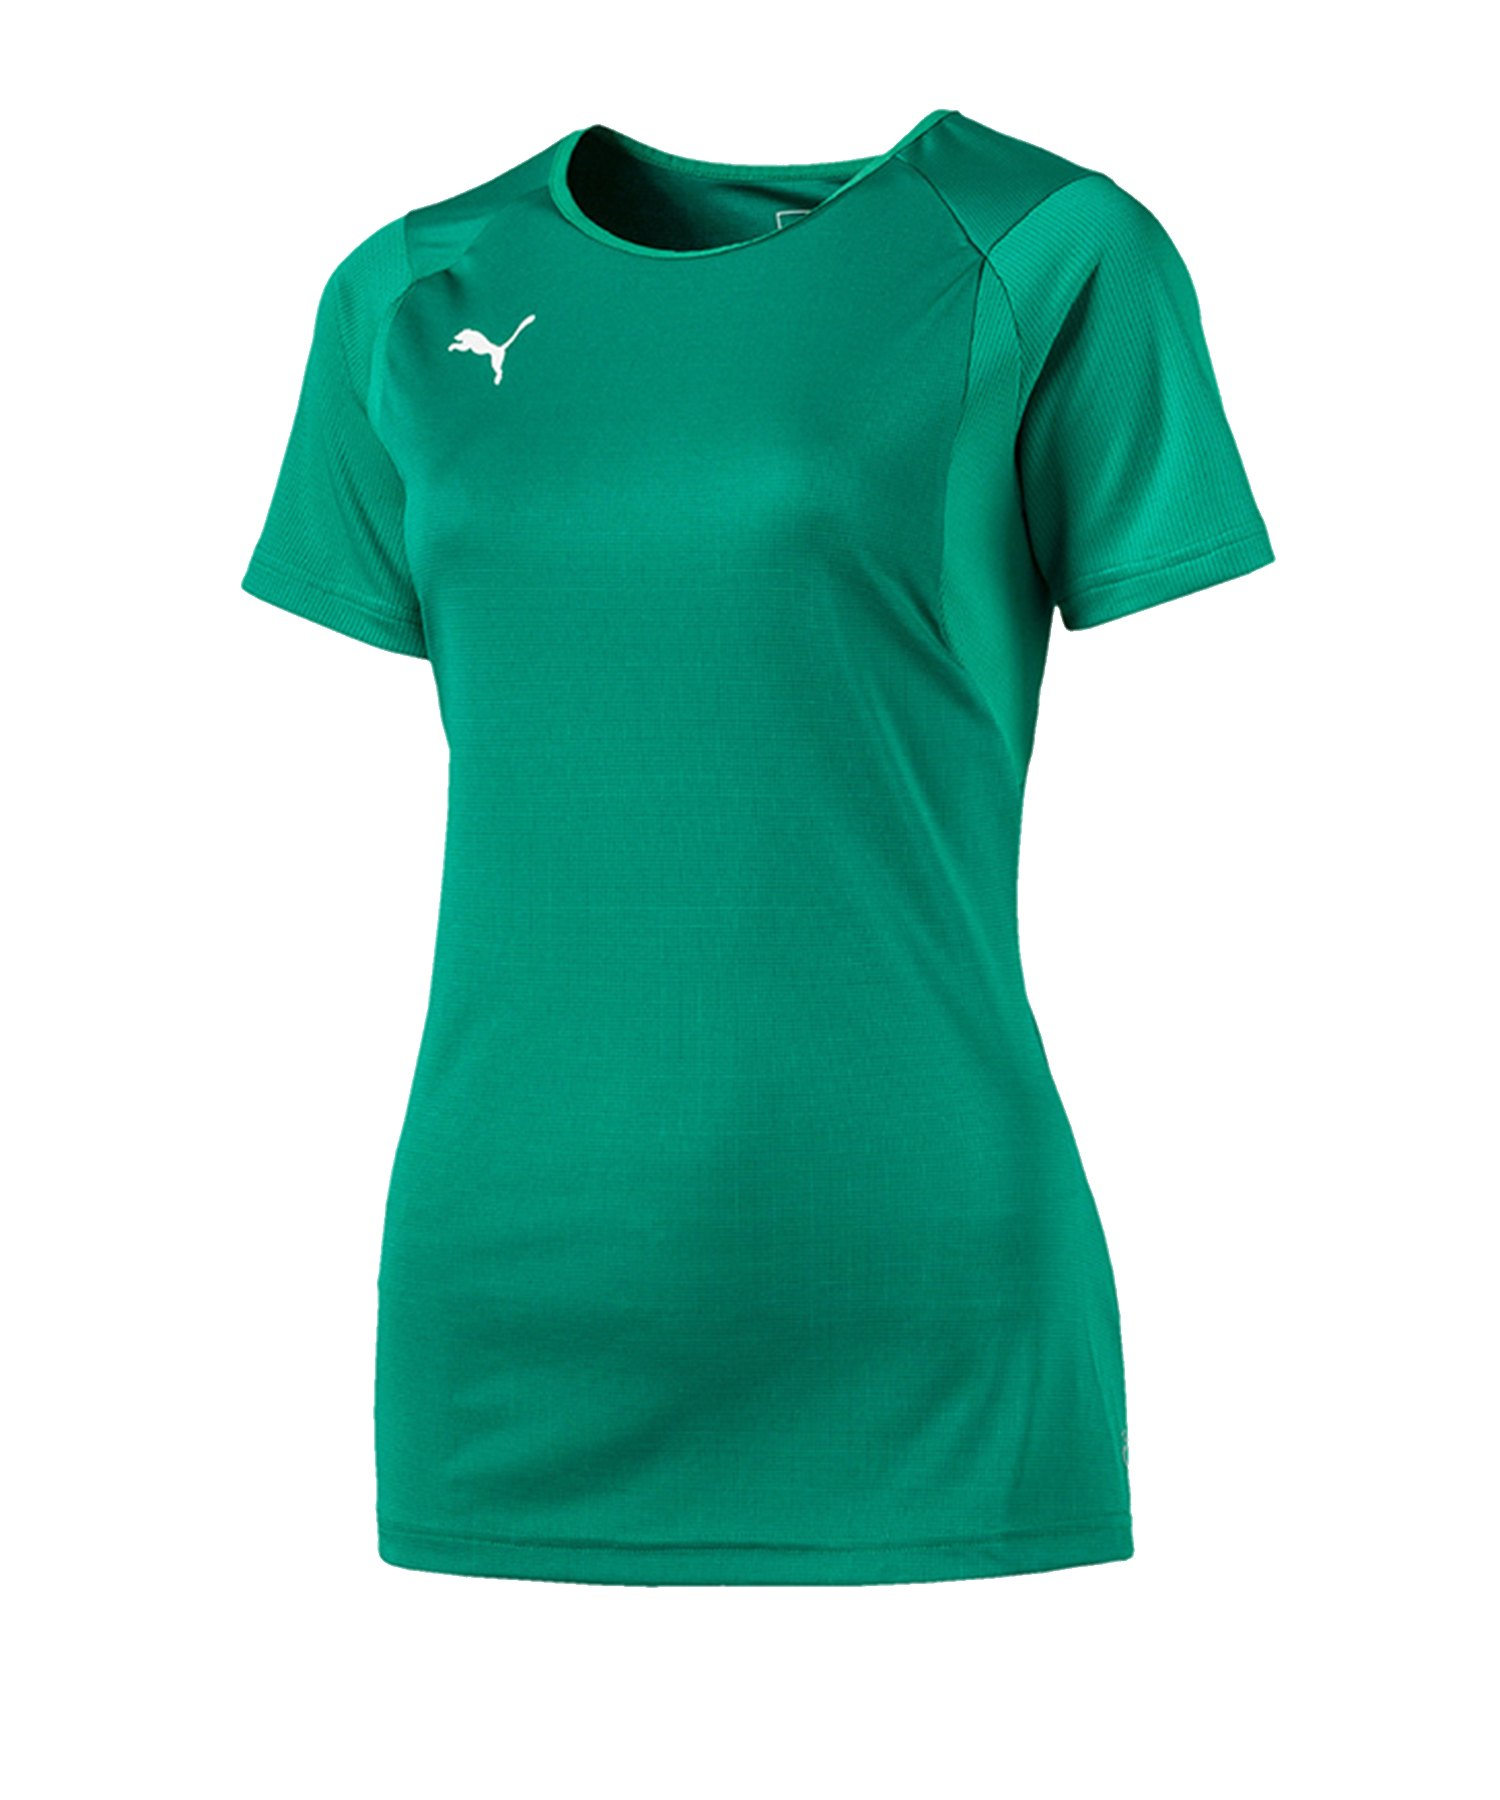 PUMA LIGA Training T-Shirt Damen Grün F05 - gruen